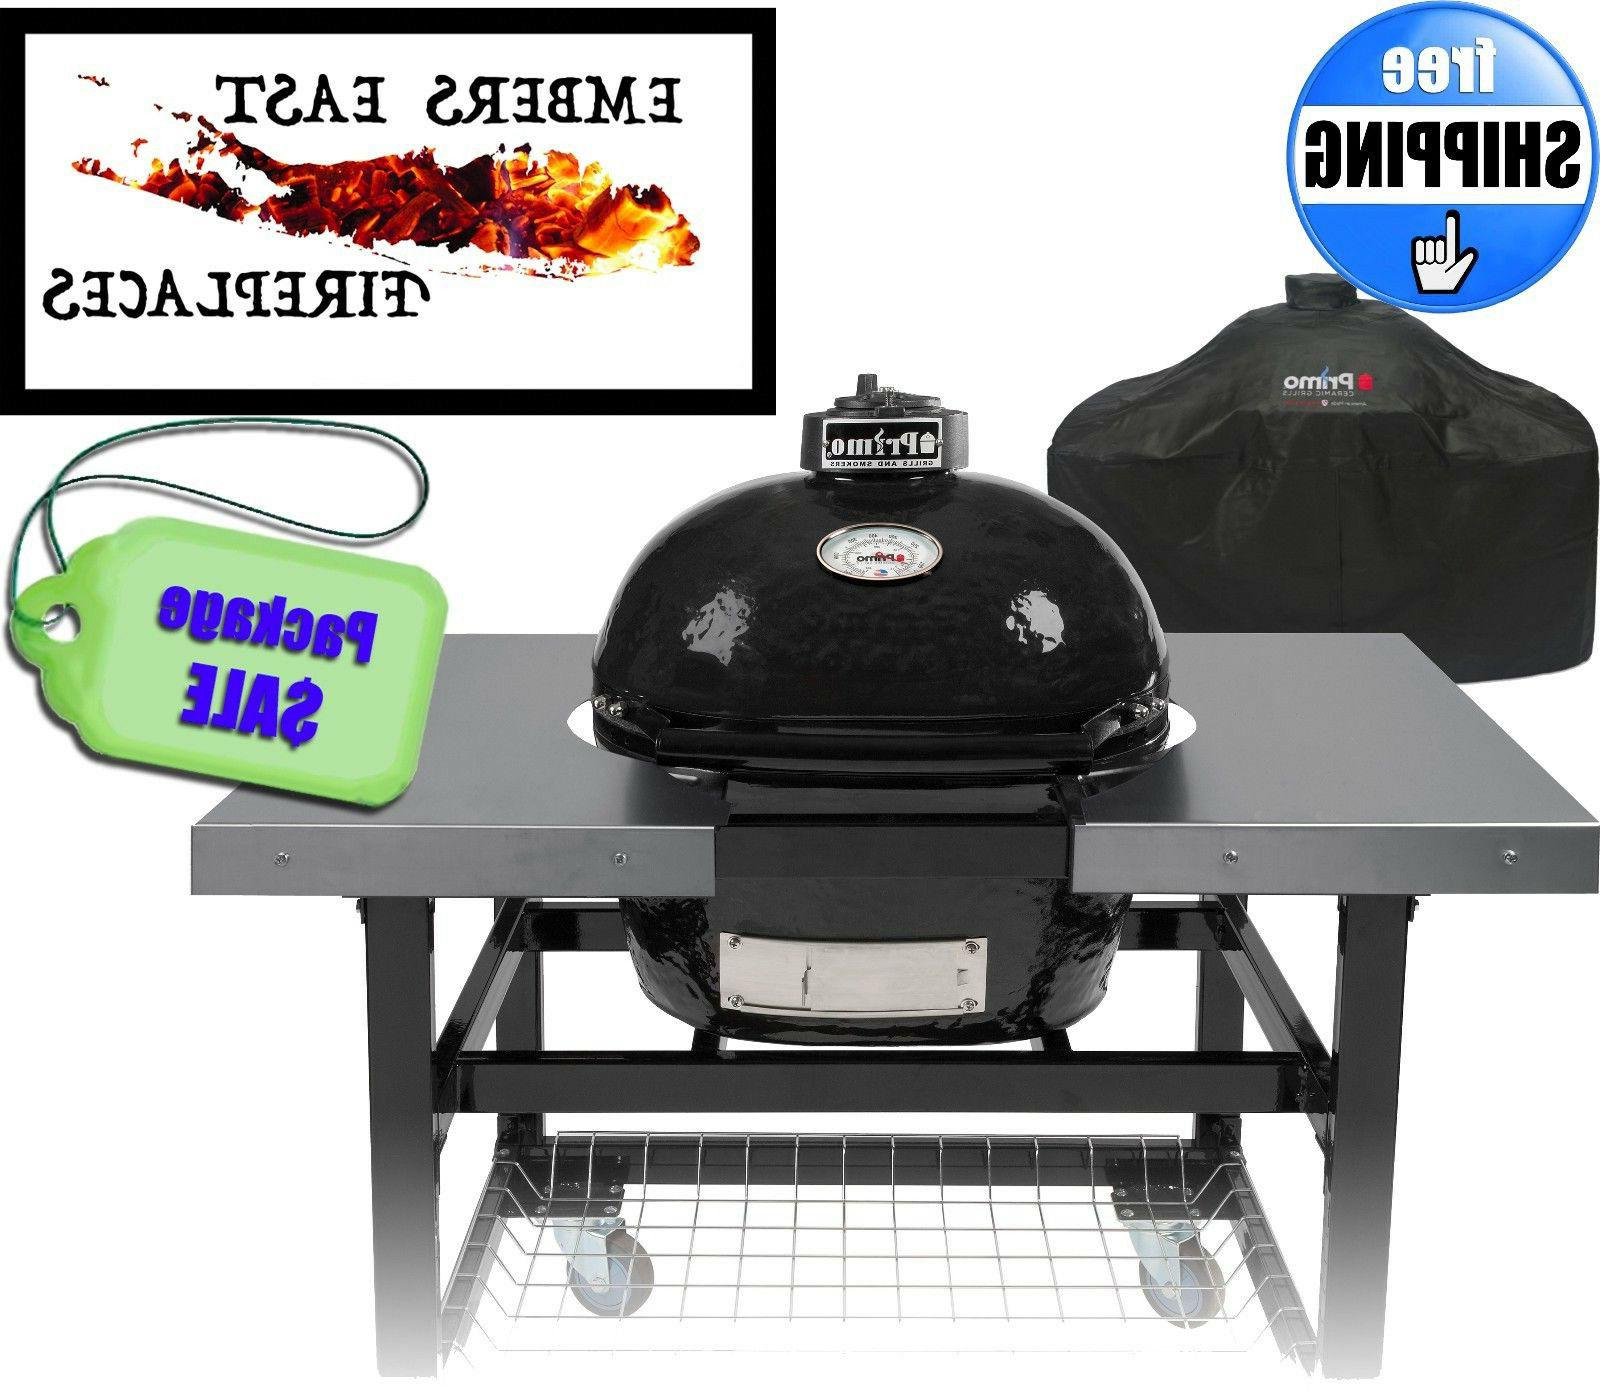 oval jr 200 bbq smoker grill bake